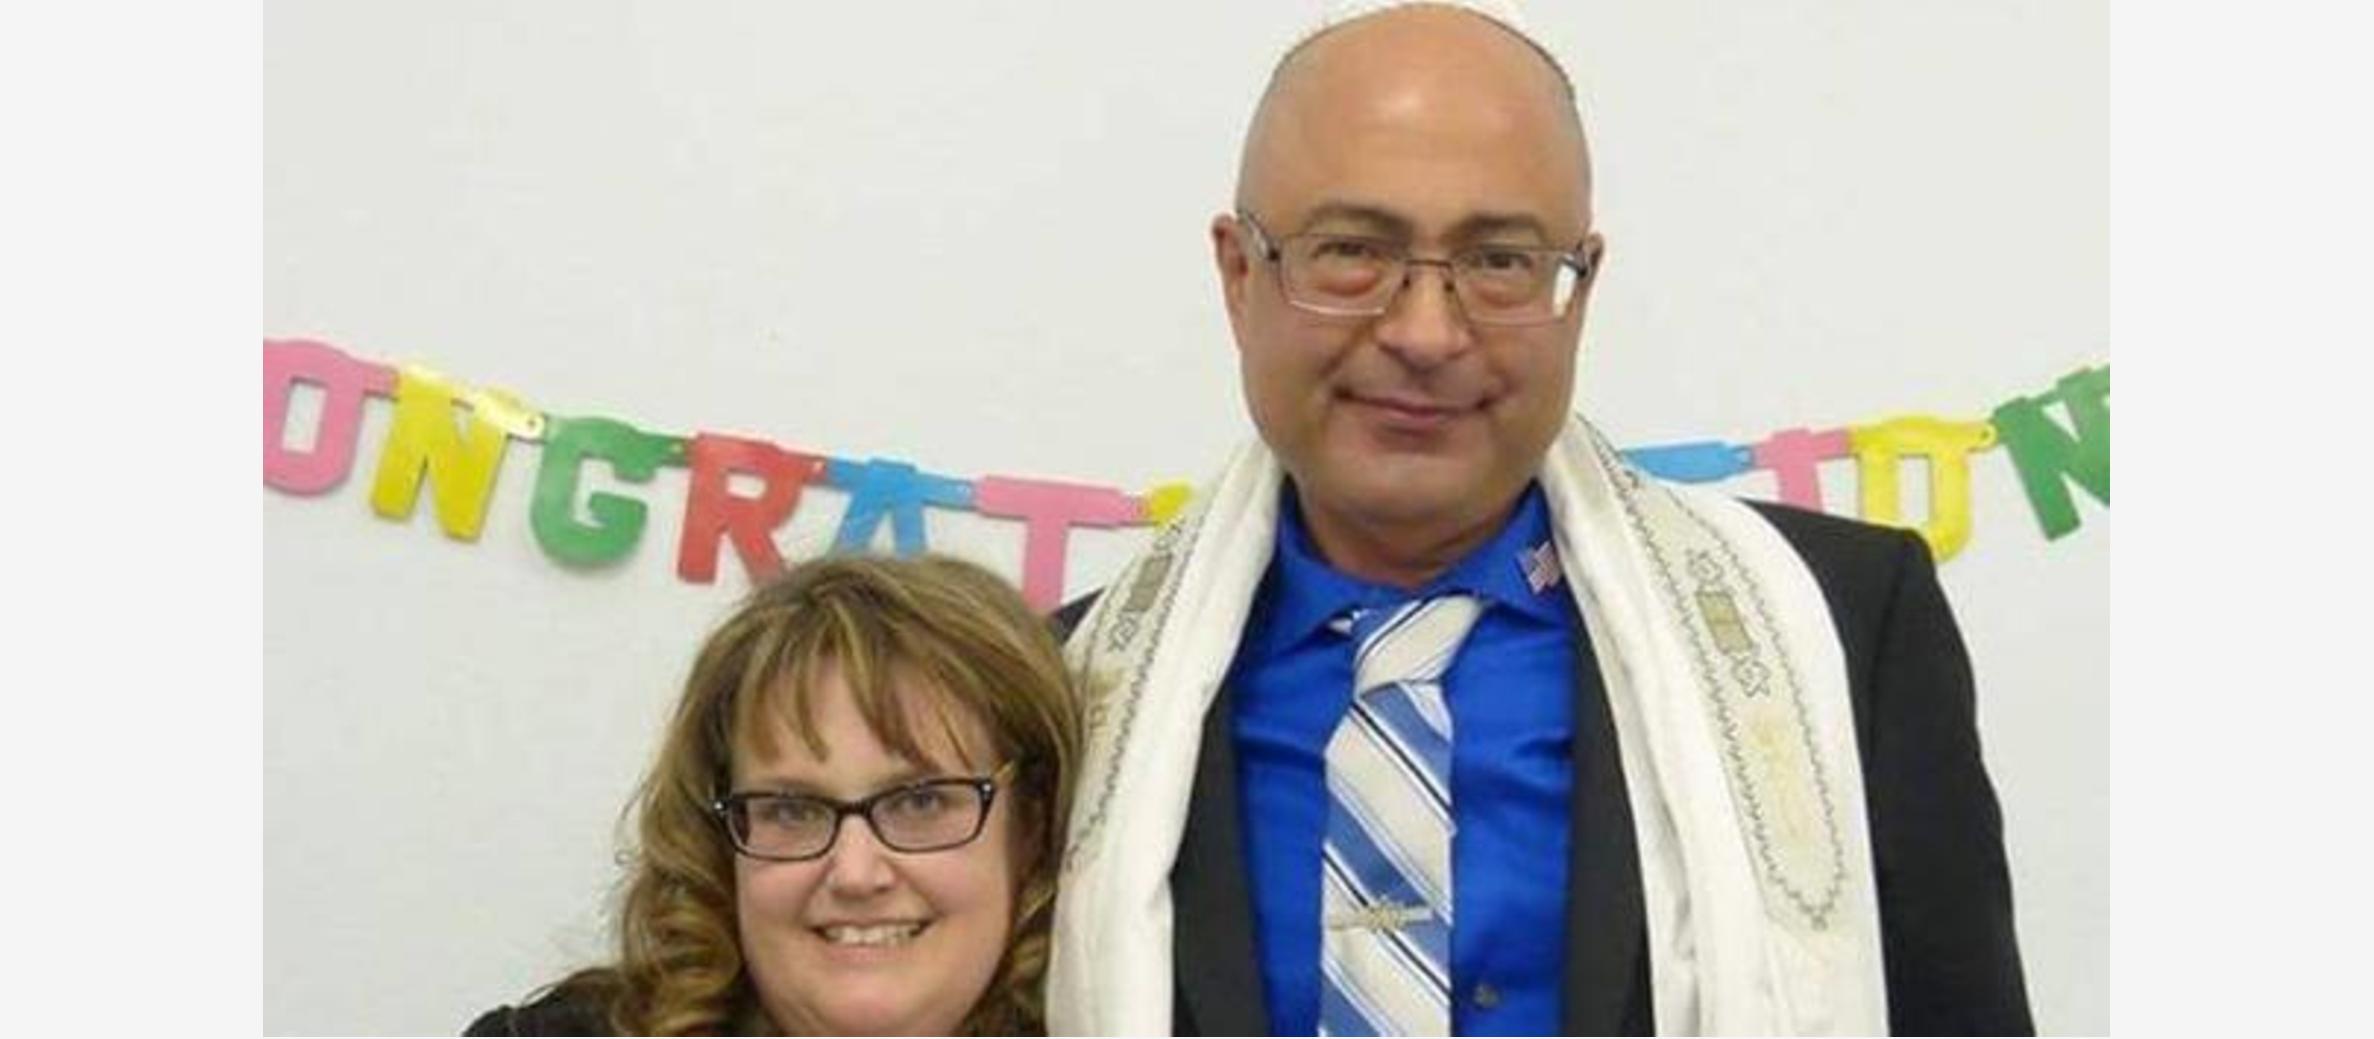 Wife of Messianic Jew killed in San Bernardino says he was martyred for beliefs